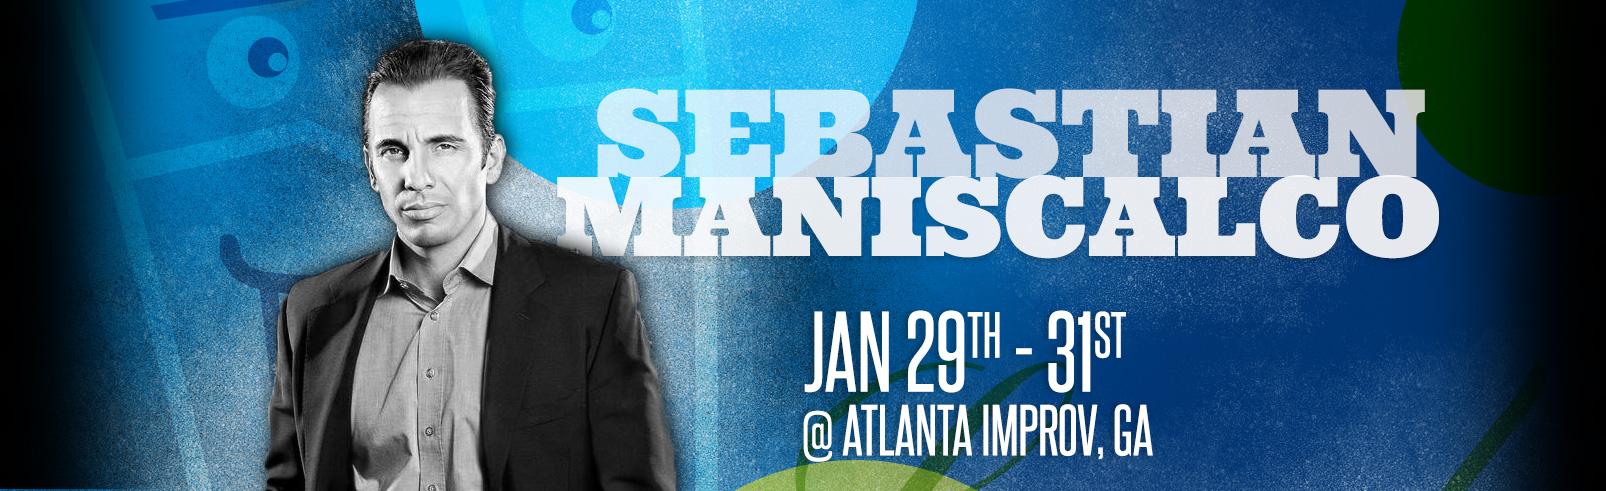 Sebastian Maniscalo @ Atlanta Improv